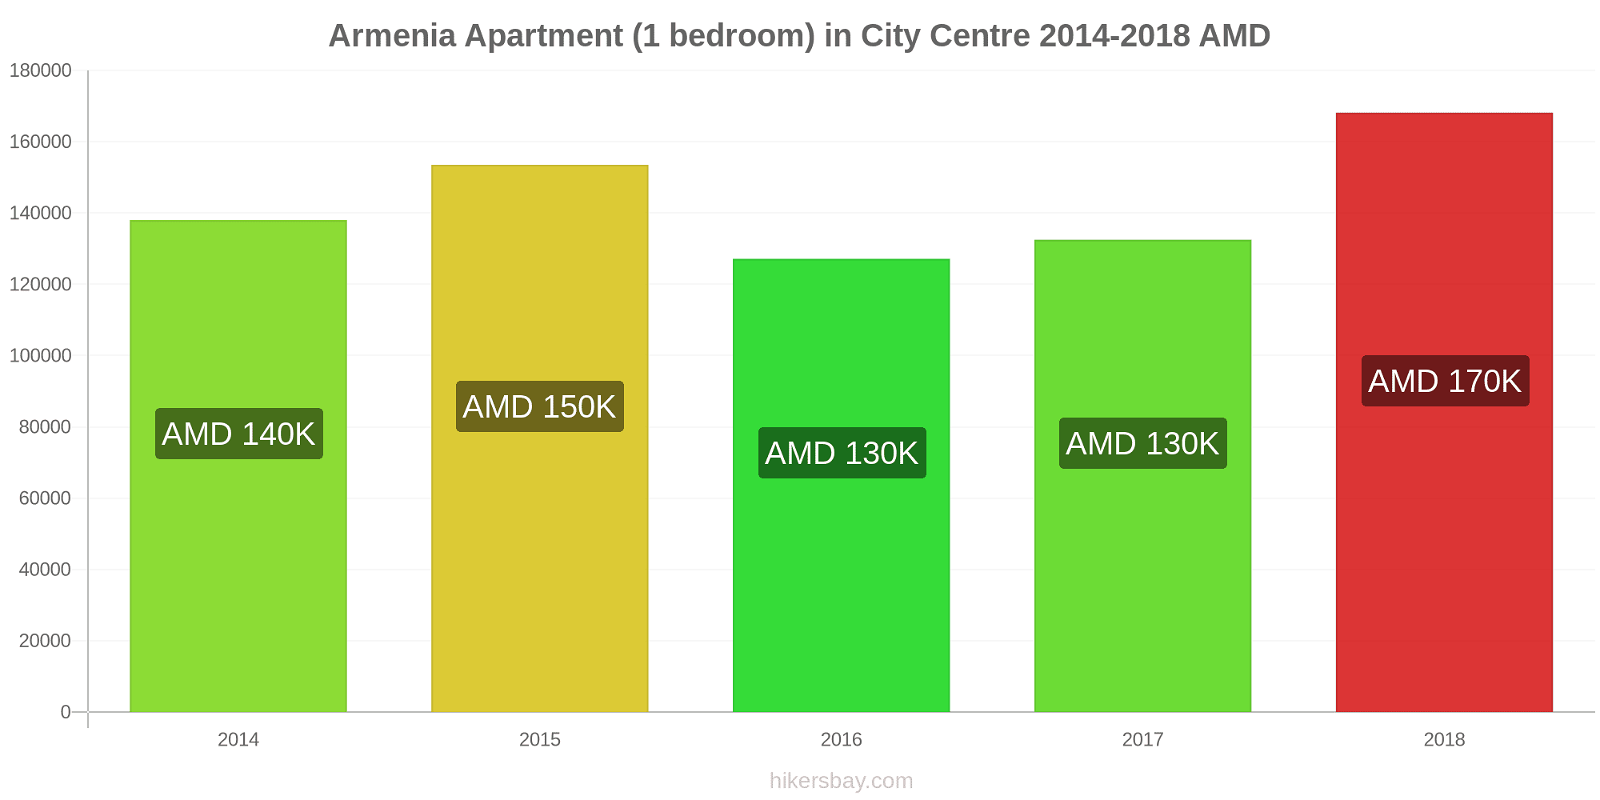 Armenia price changes Apartment (1 bedroom) in City Centre hikersbay.com